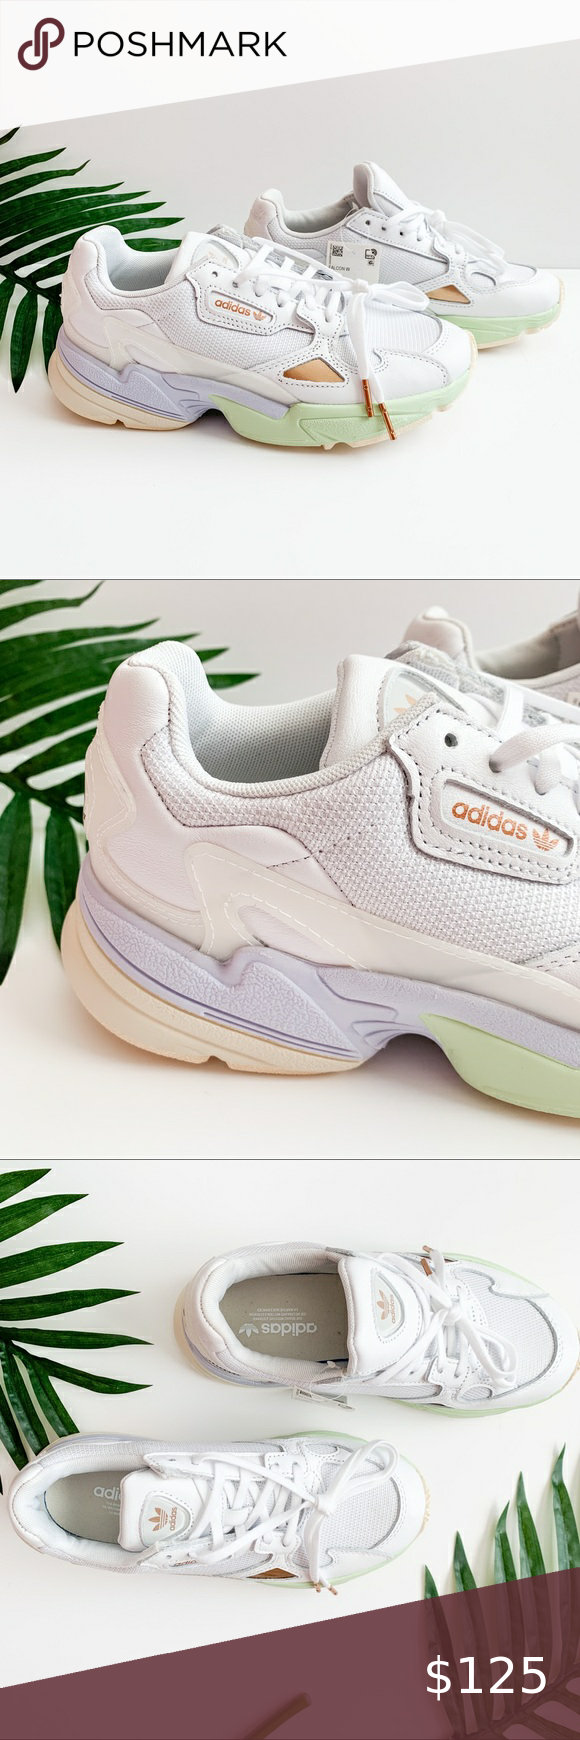 Adidas | Falcon Shoes Adidas Falcon Shoes. Women's Size 6. NWT, No ...